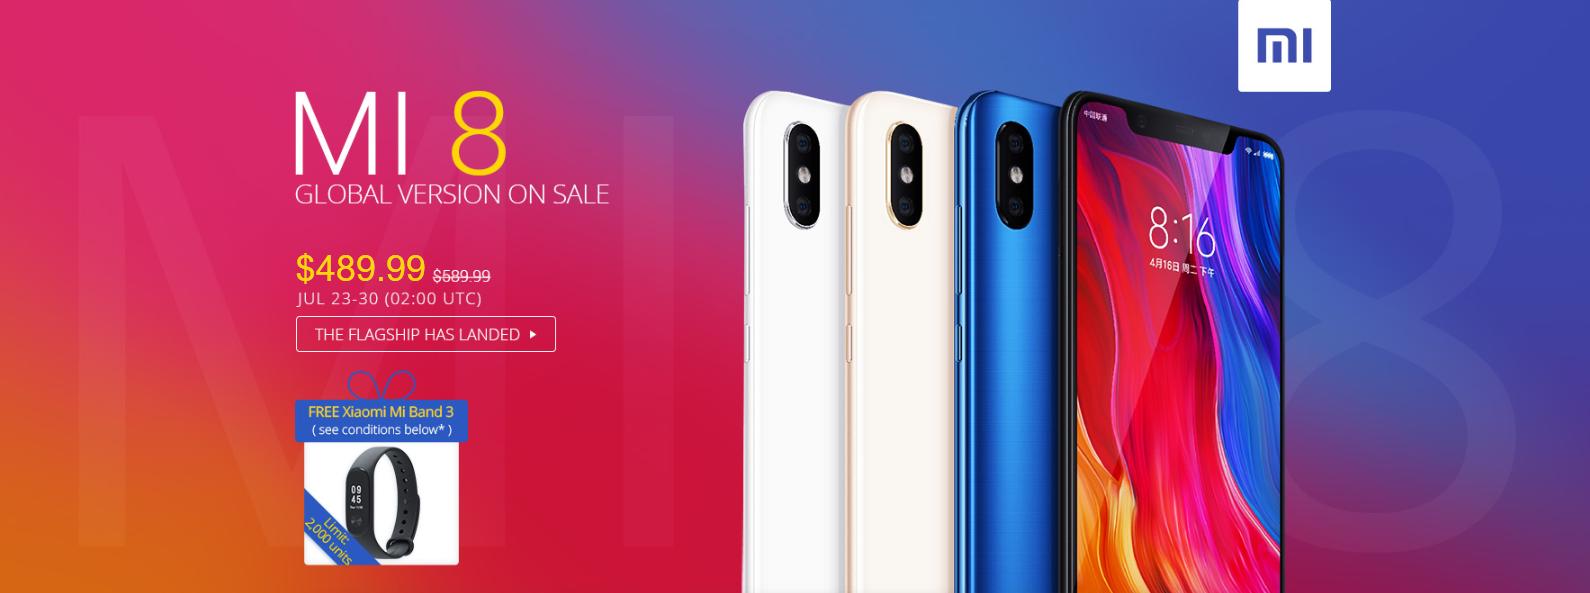 Xiaomi Mi A2, Mi A2 lite e Mi 8 Global sbarcano su Gearbest e ti regalano una Mi Band 3!